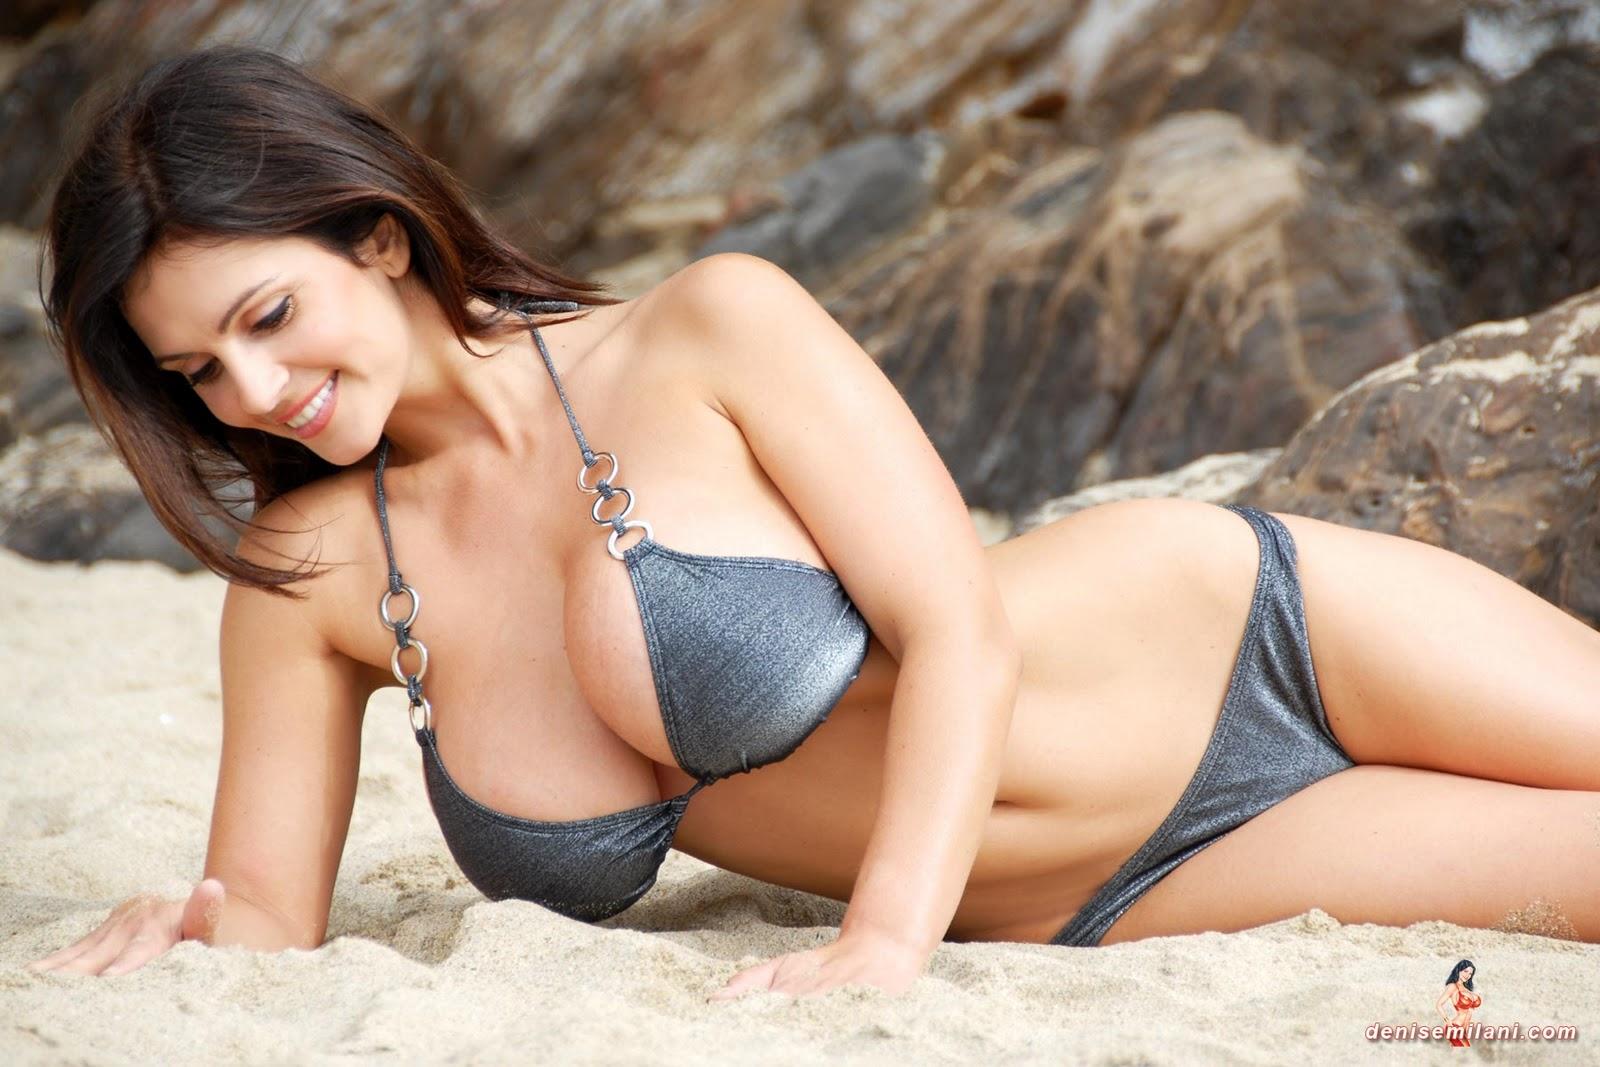 denise milani -bikini wallpapers | MovieMasala